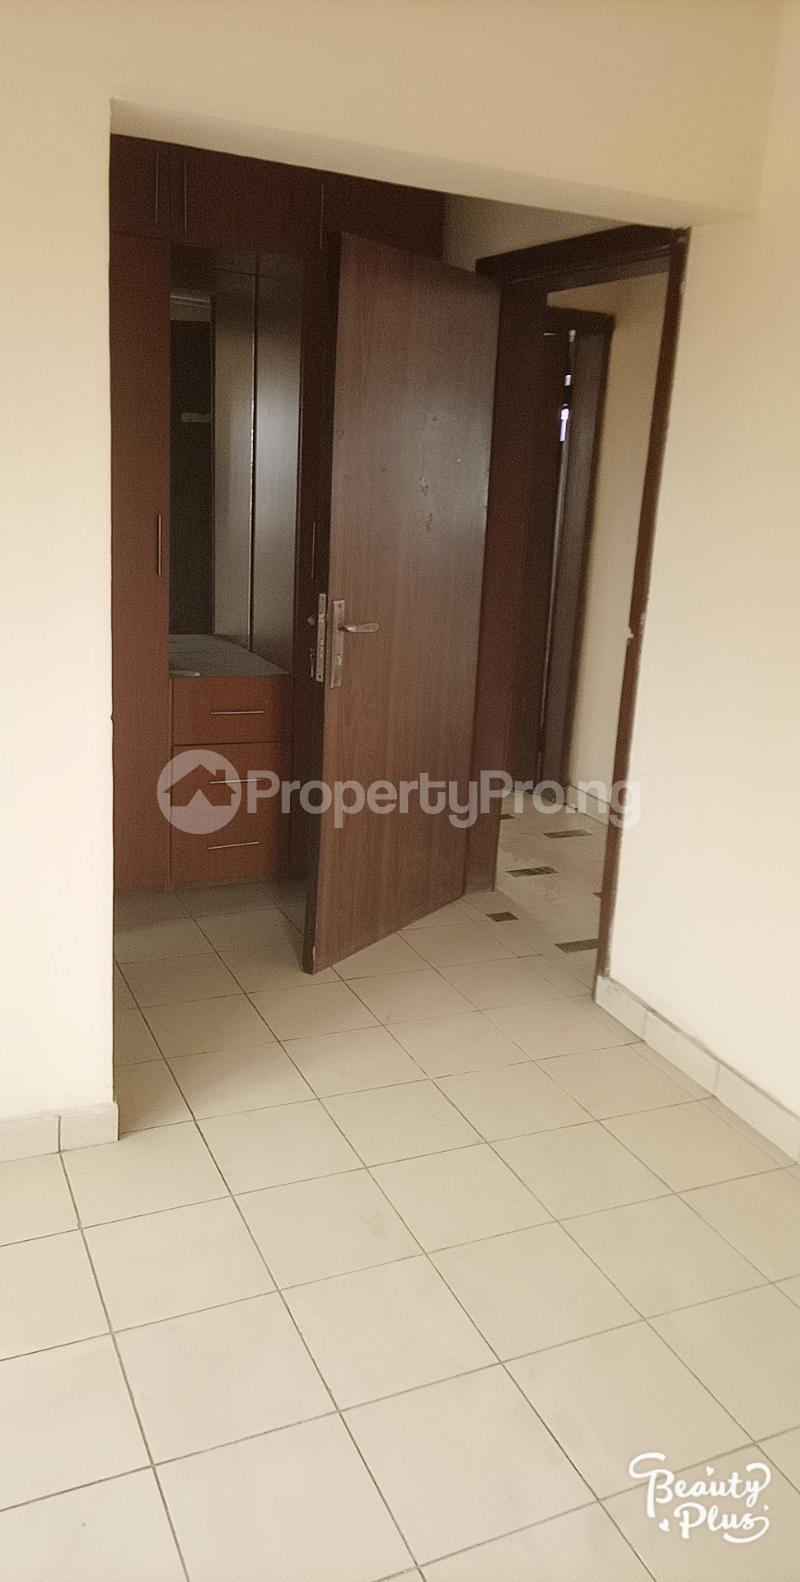 3 bedroom Flat / Apartment for rent Oke Afa isolo. Lagos Mainland Oke-Afa Isolo Lagos - 8